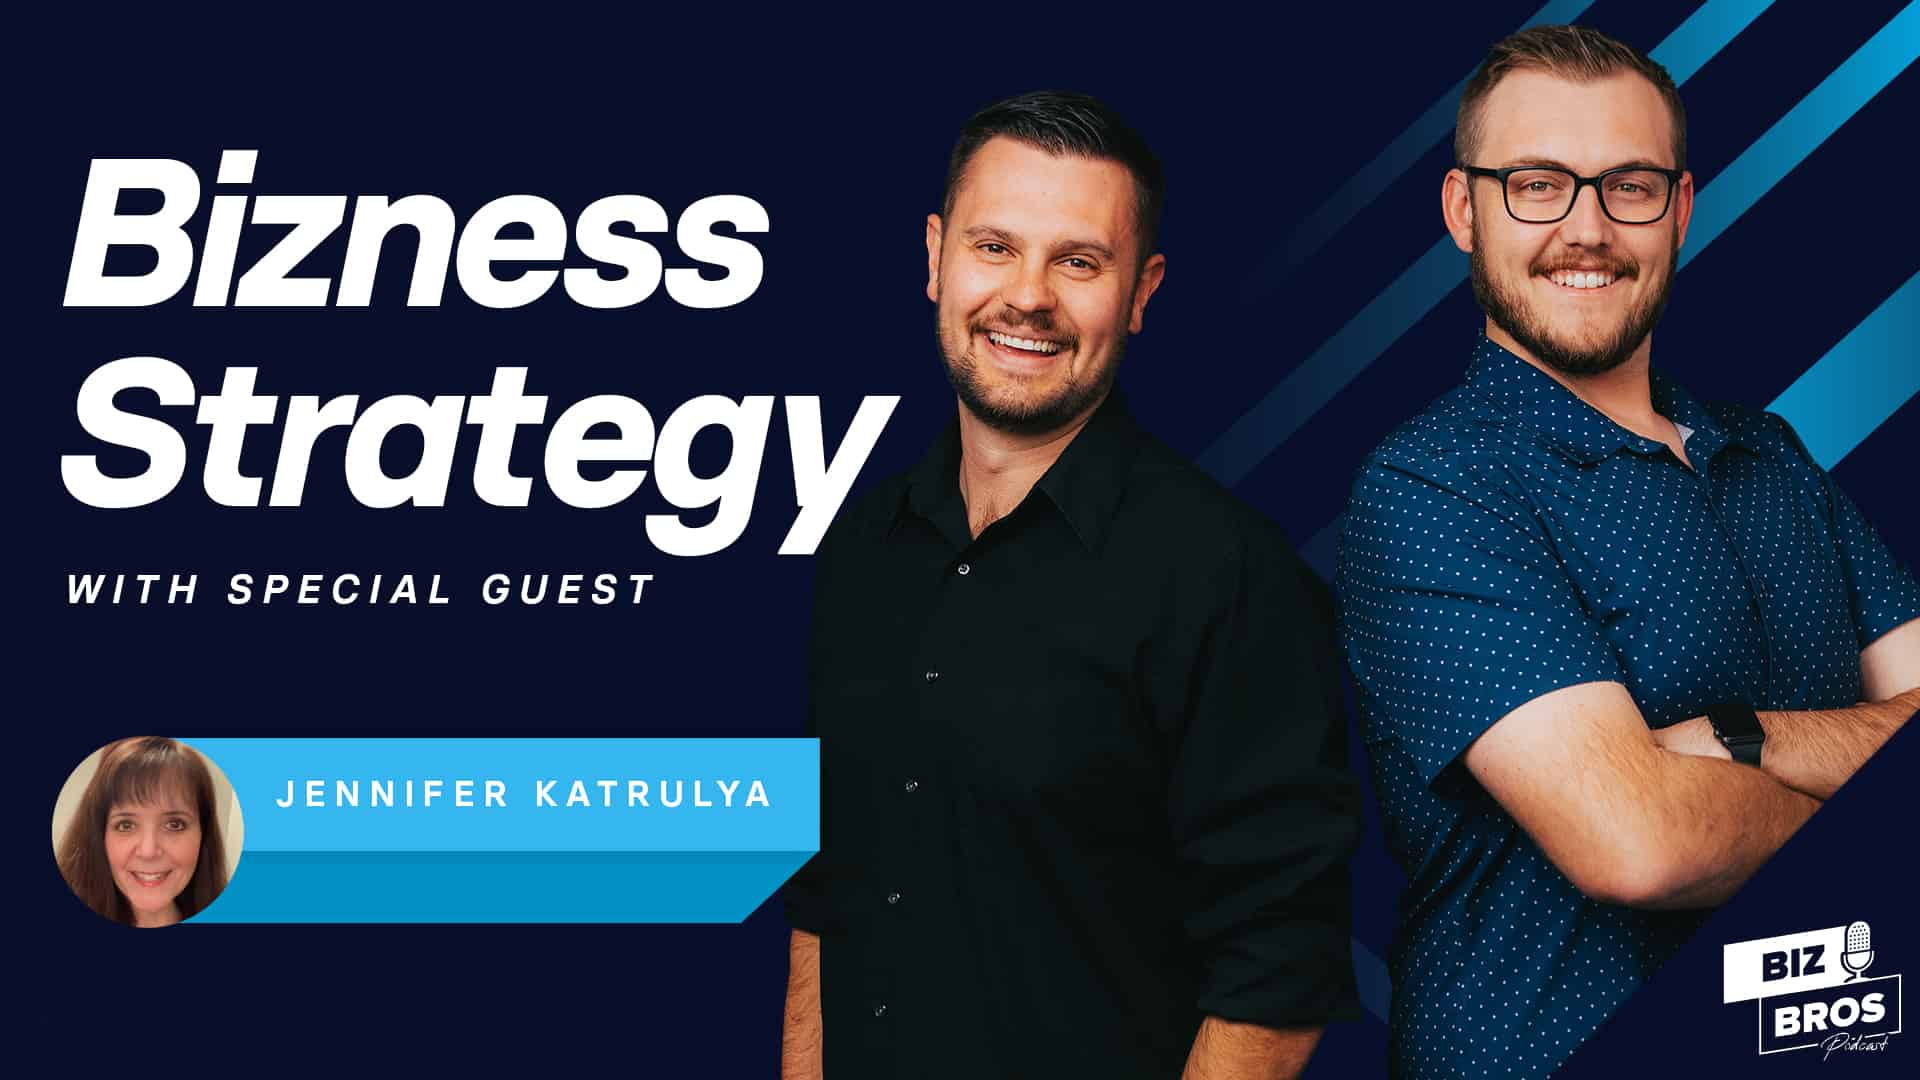 Ways to Find Profit and Efficiencies to Dramatically Improve Company Performance with Jennifer Katrulya